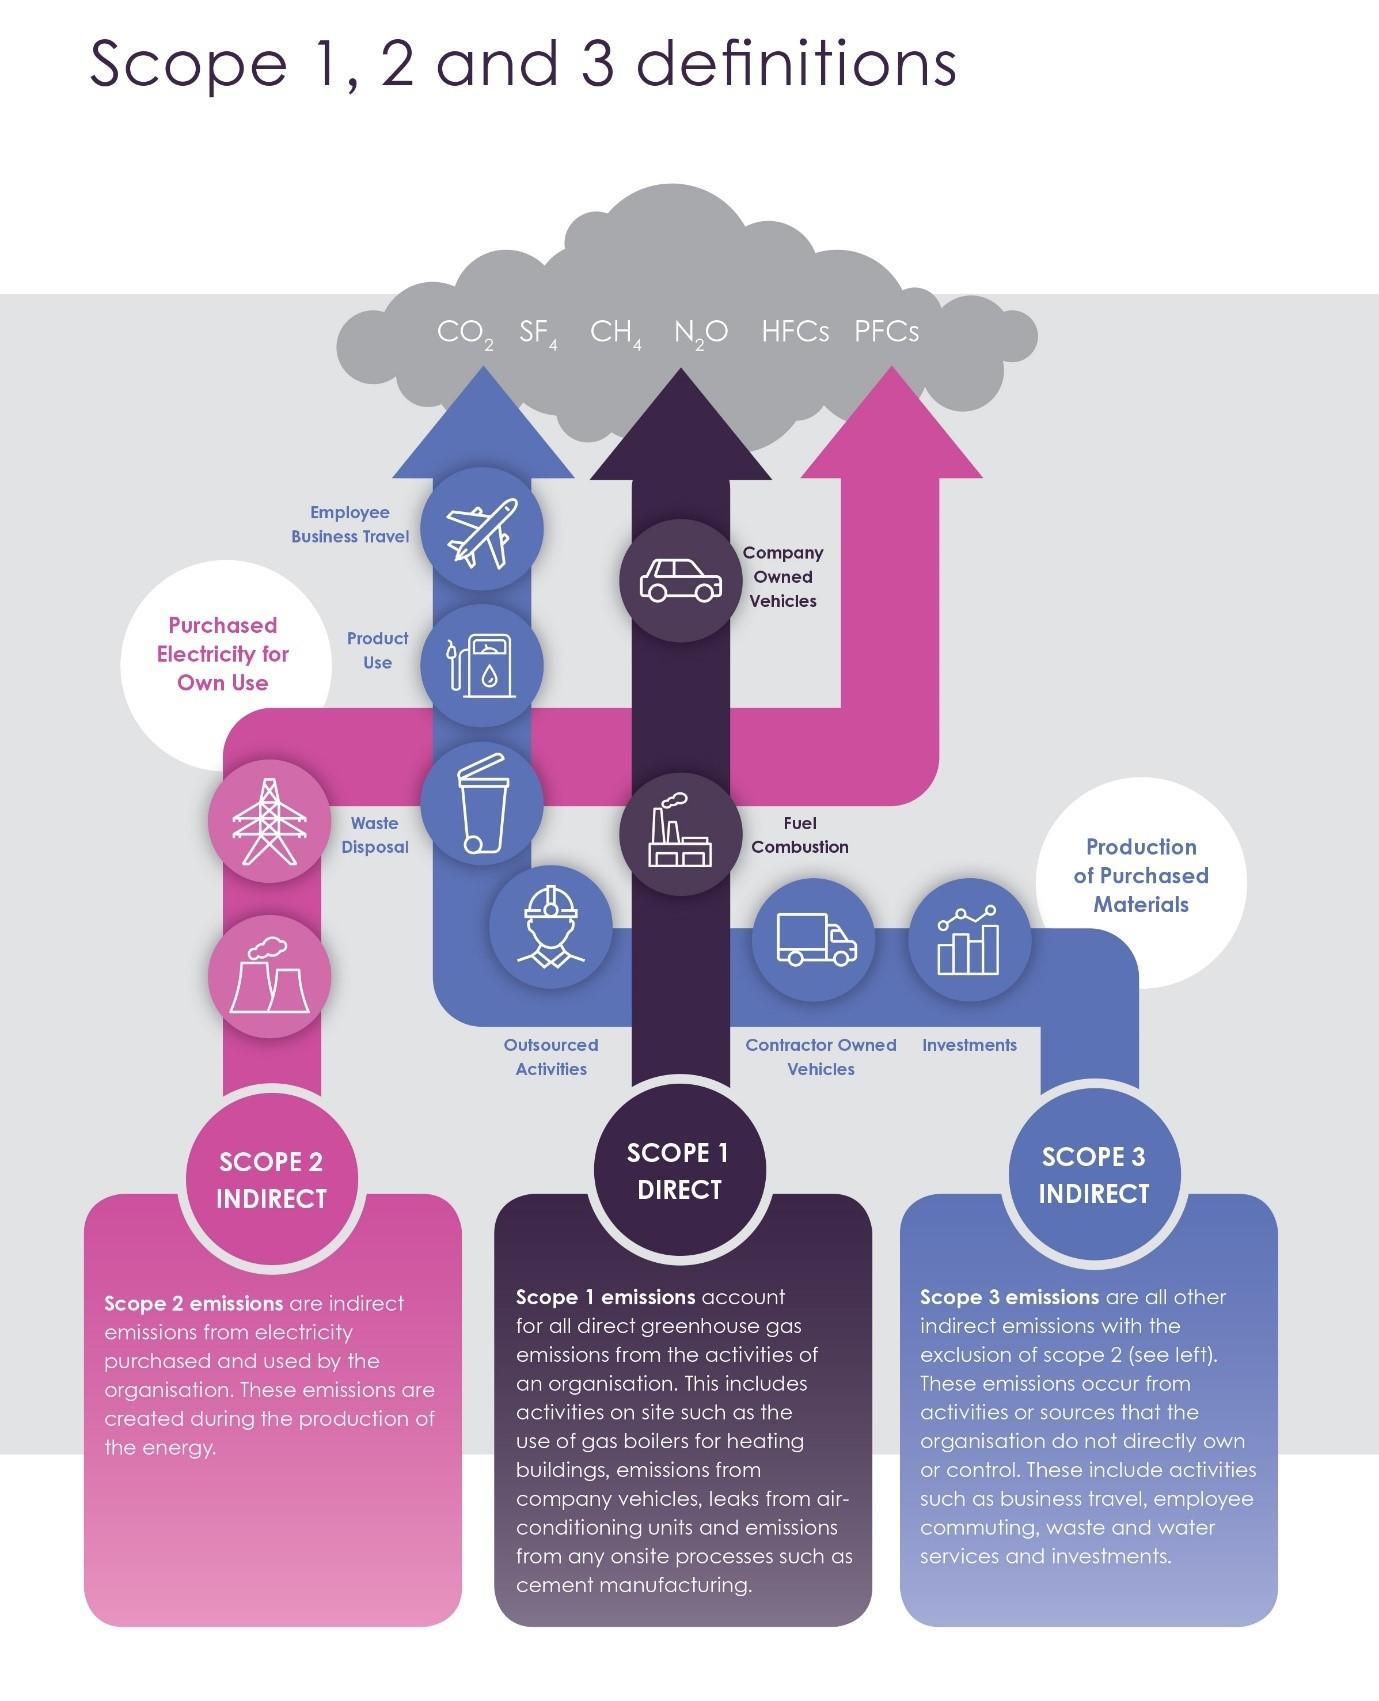 Brunel Pension Partnership - Scope definition graphic